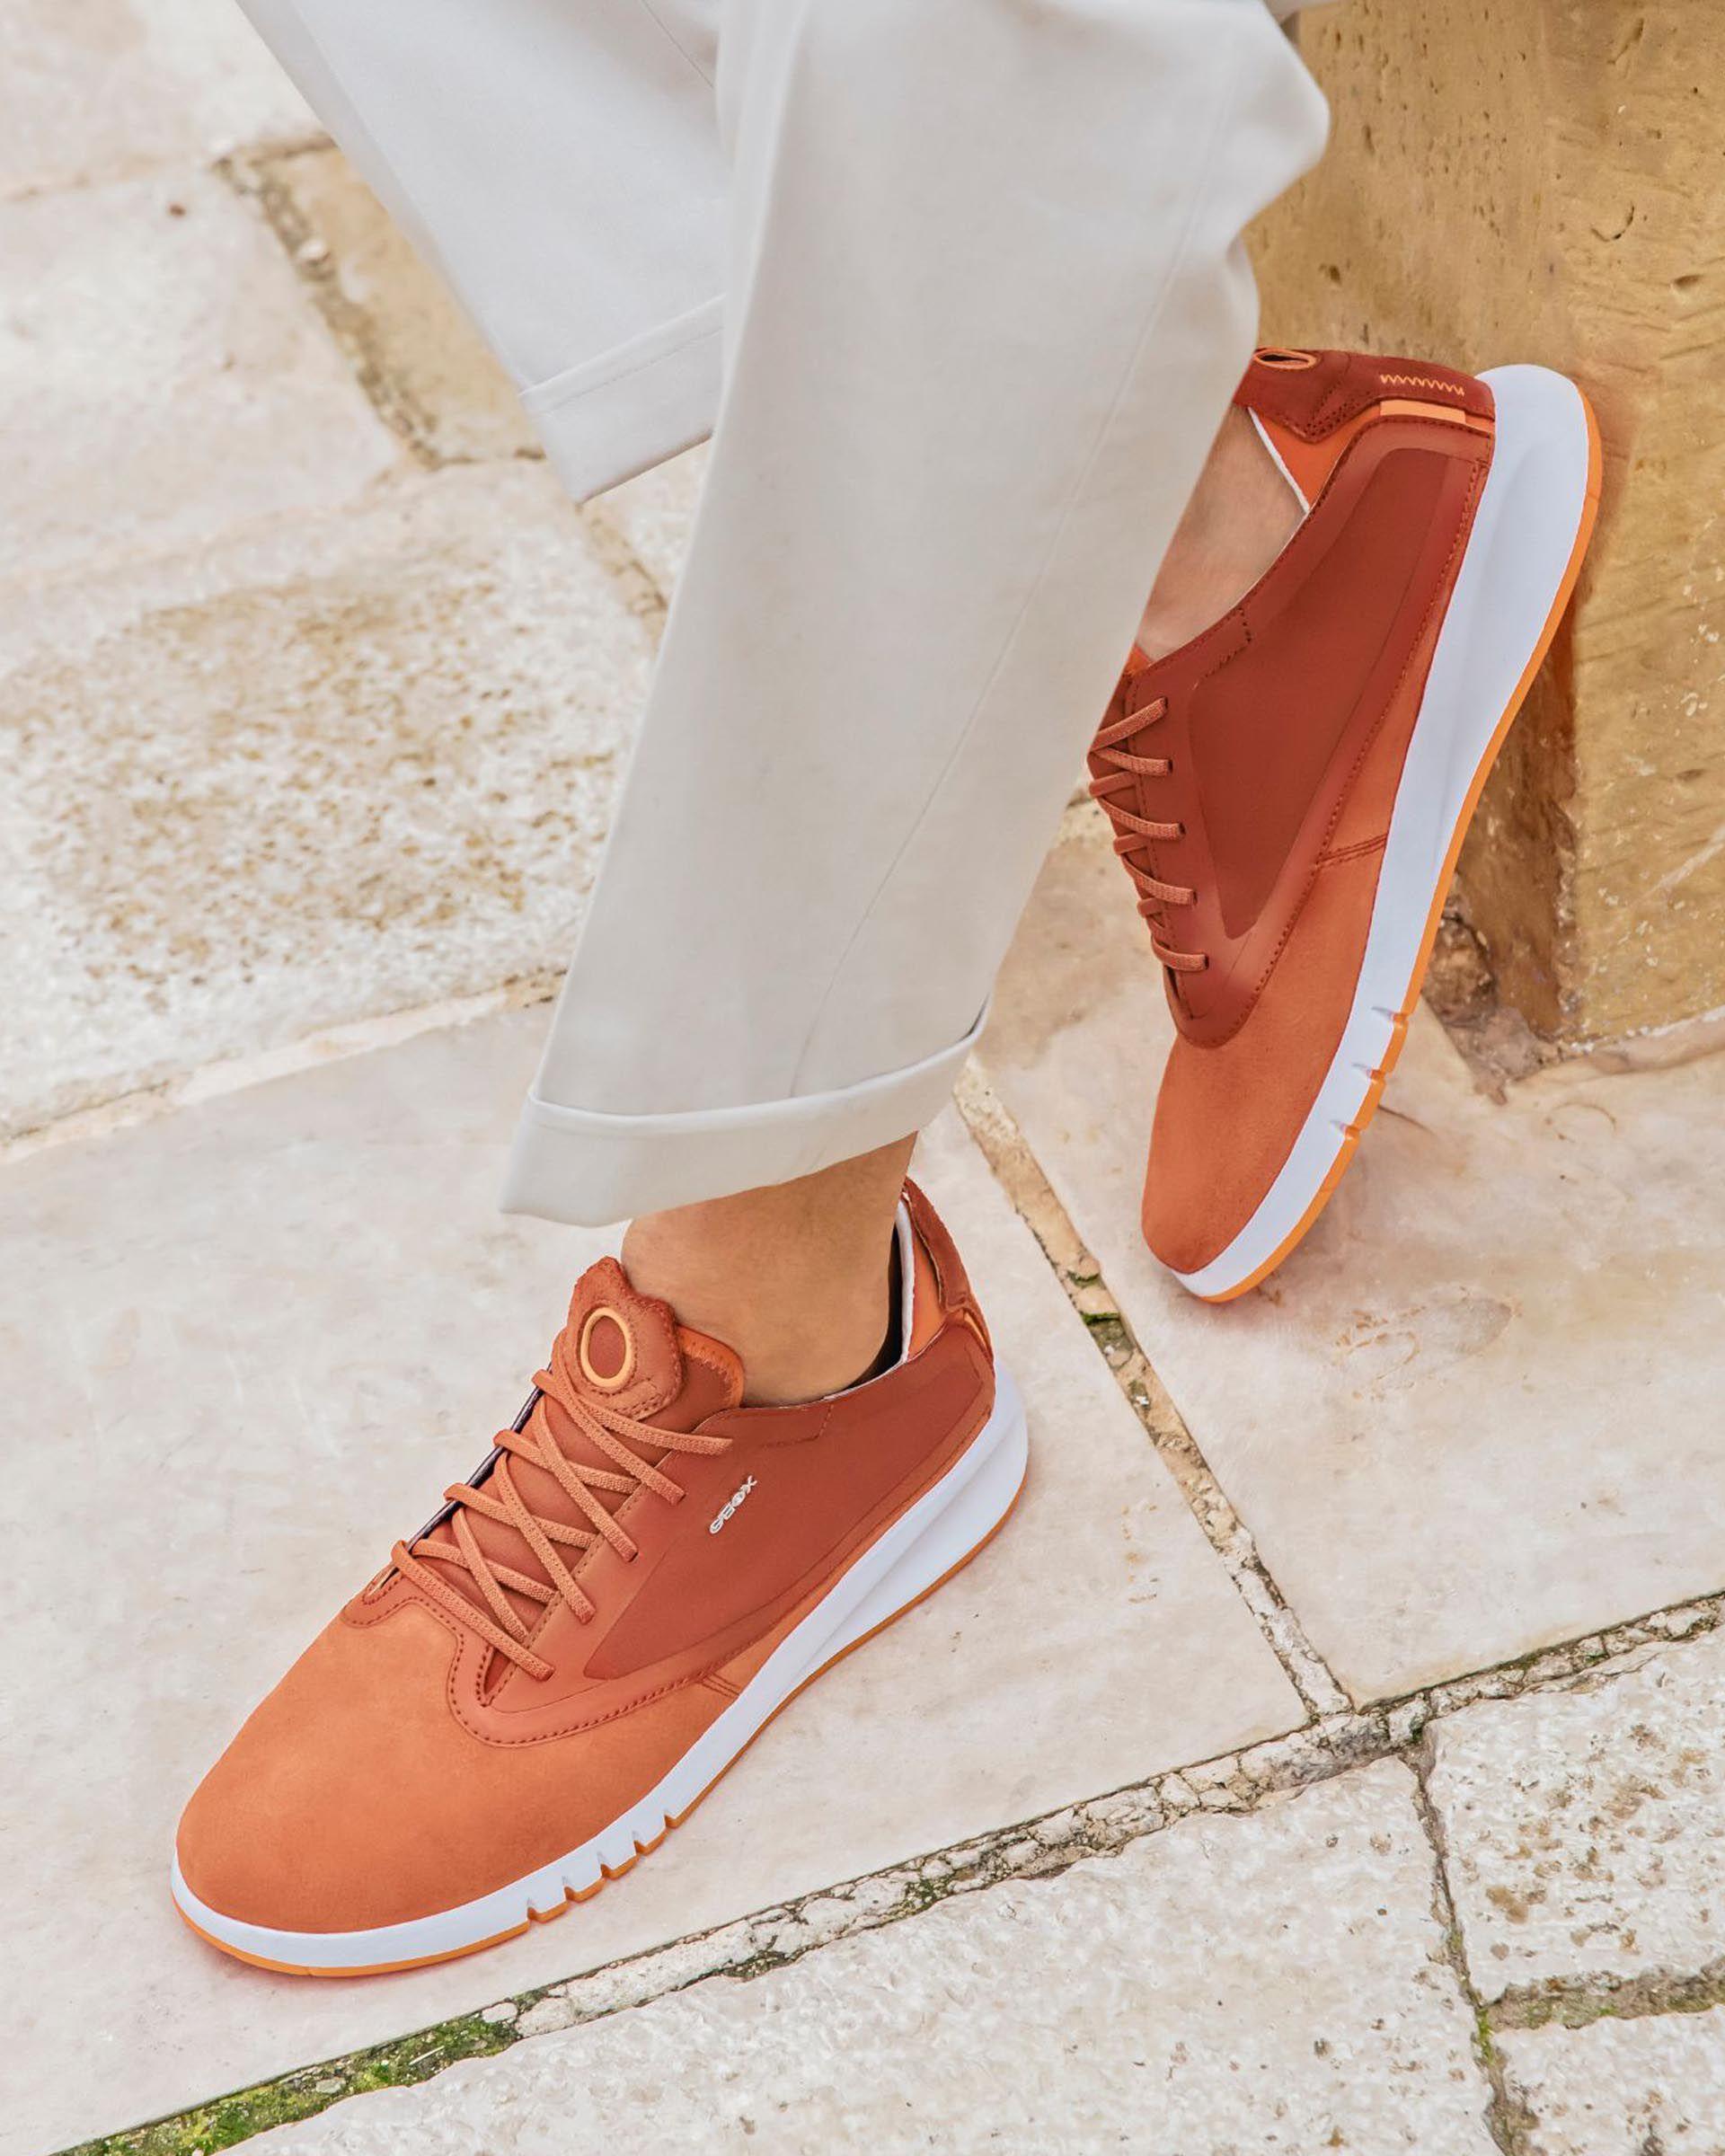 Geox AERANTIS Man: Chestnut Sneakers